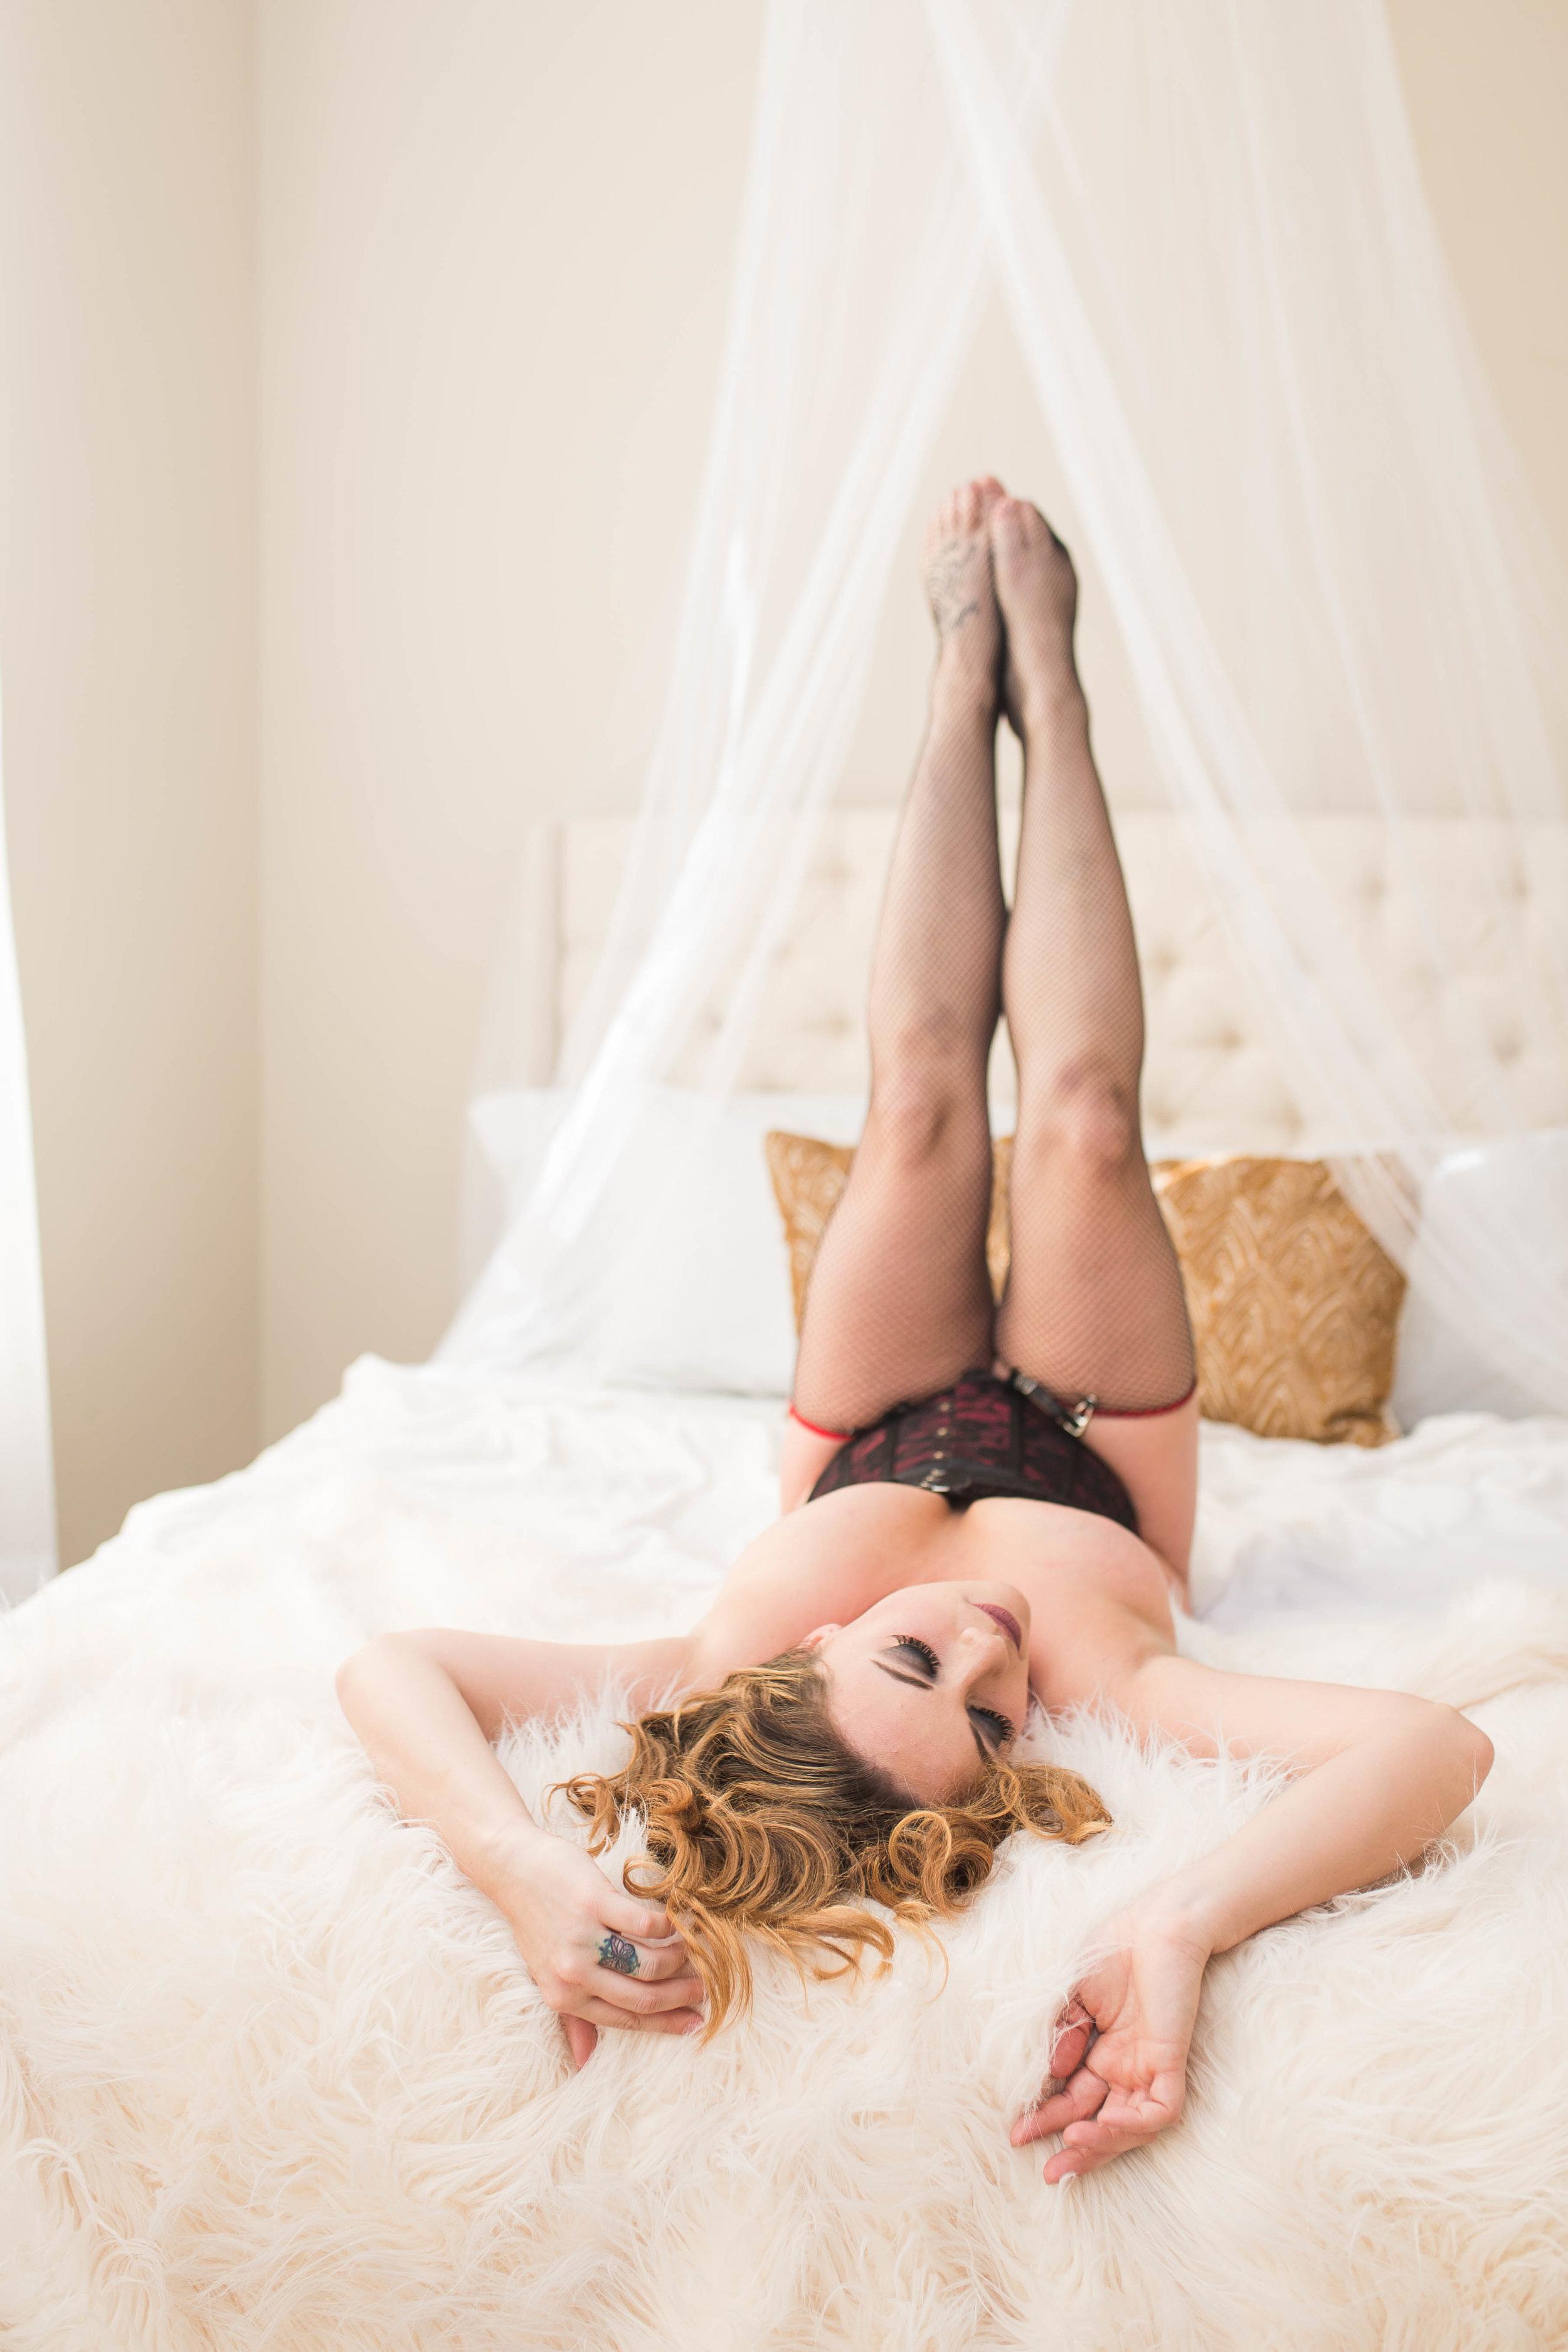 Fayetteville North Carolina Boudoir Photographer - Intimate Women's Portraiture